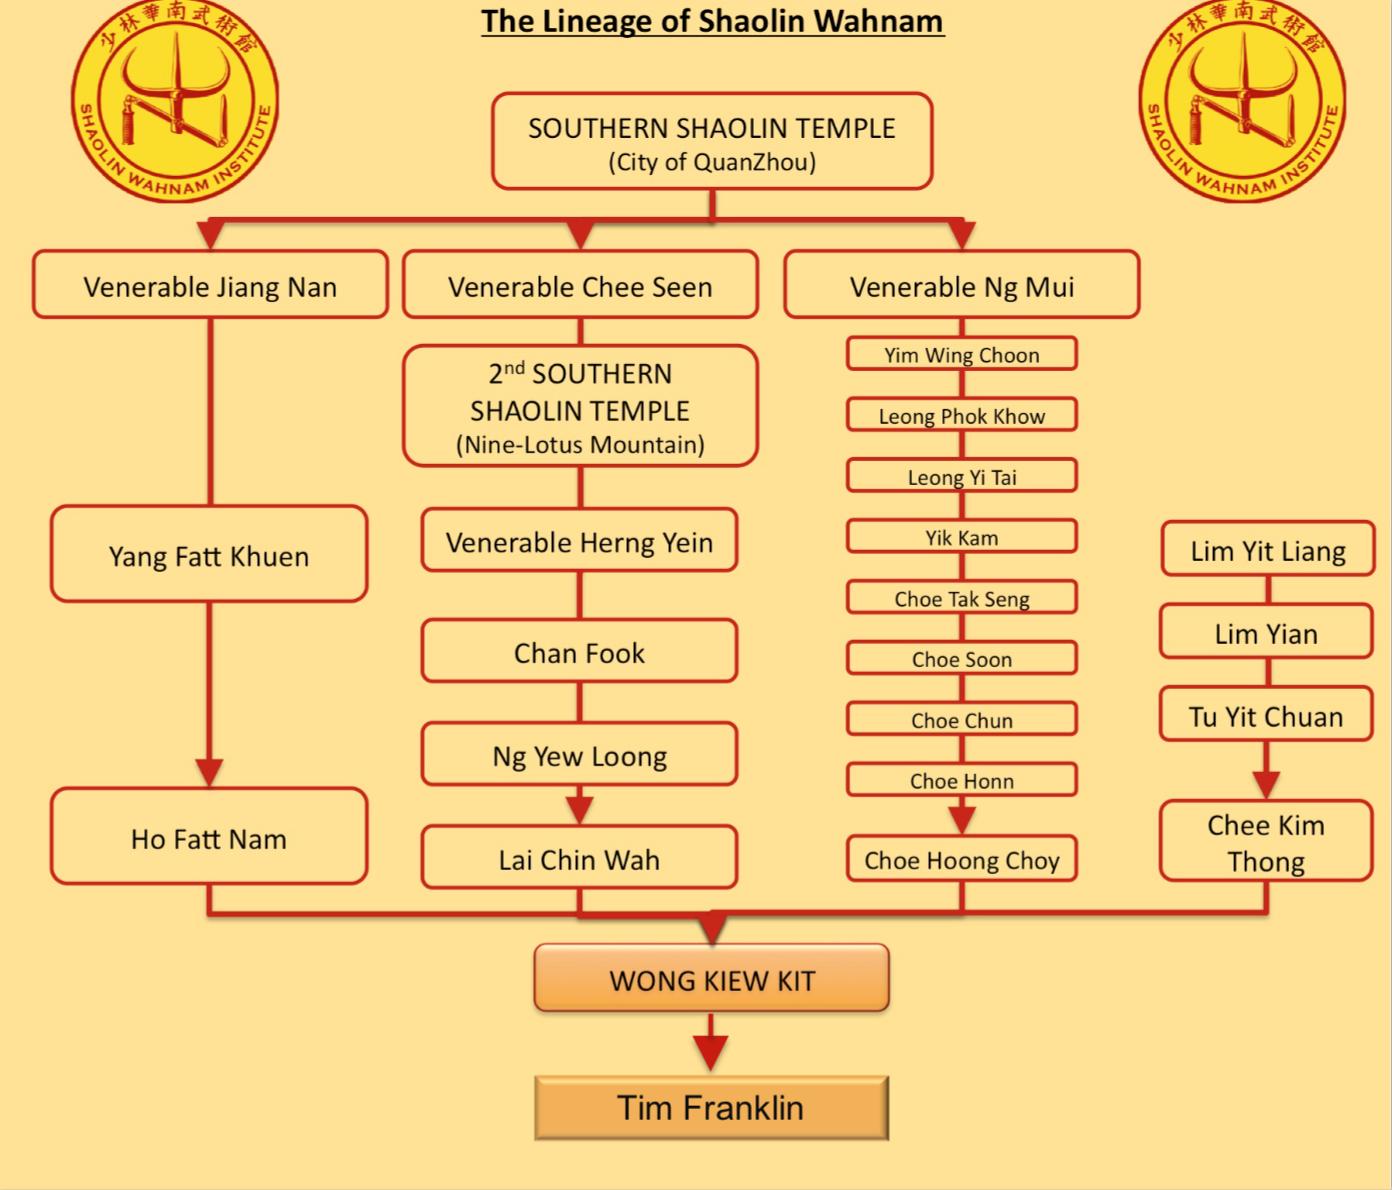 Shaolin Lineage